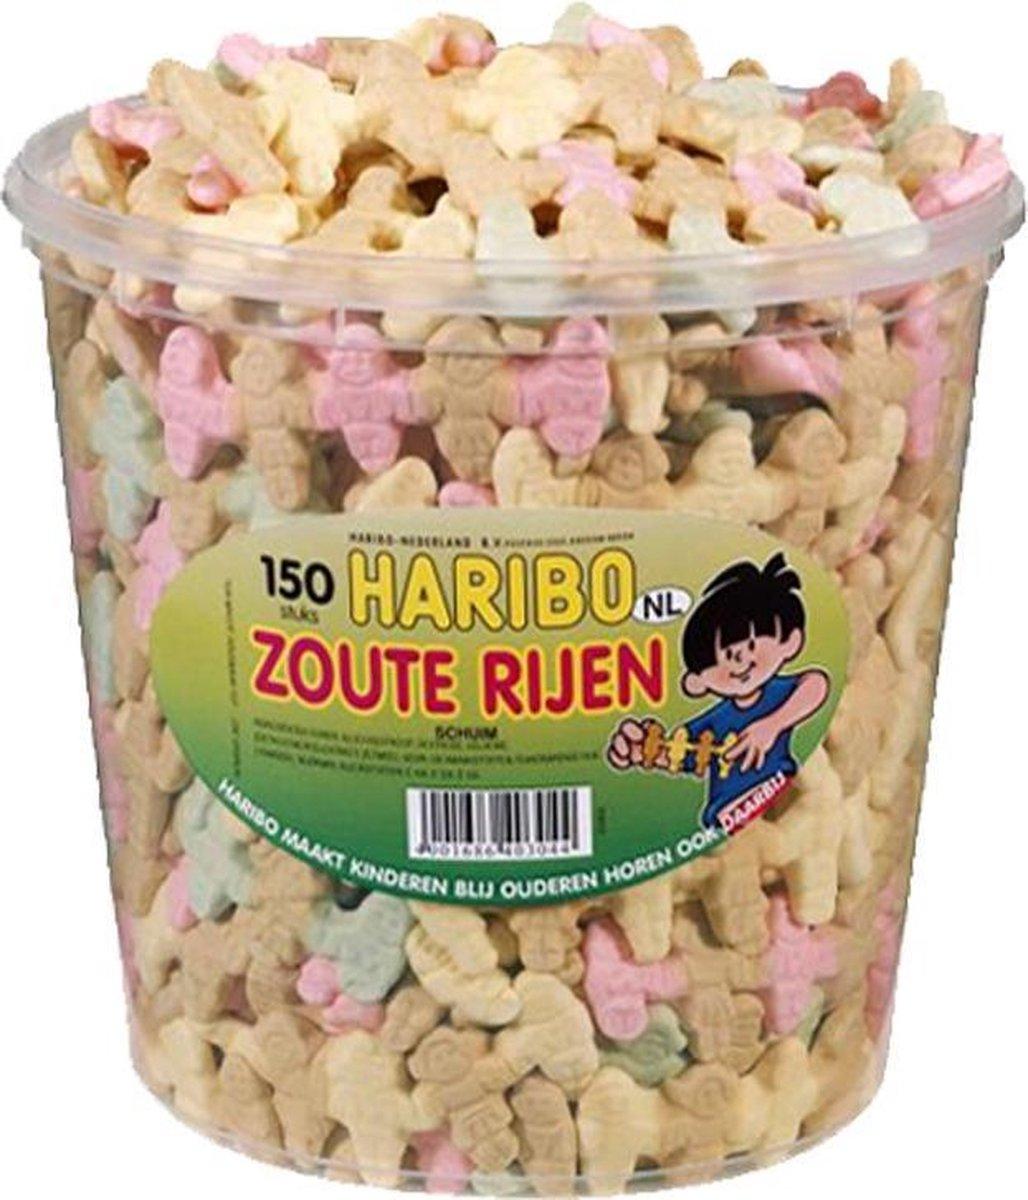 Haribo Zoute Rijen - 150 stuks